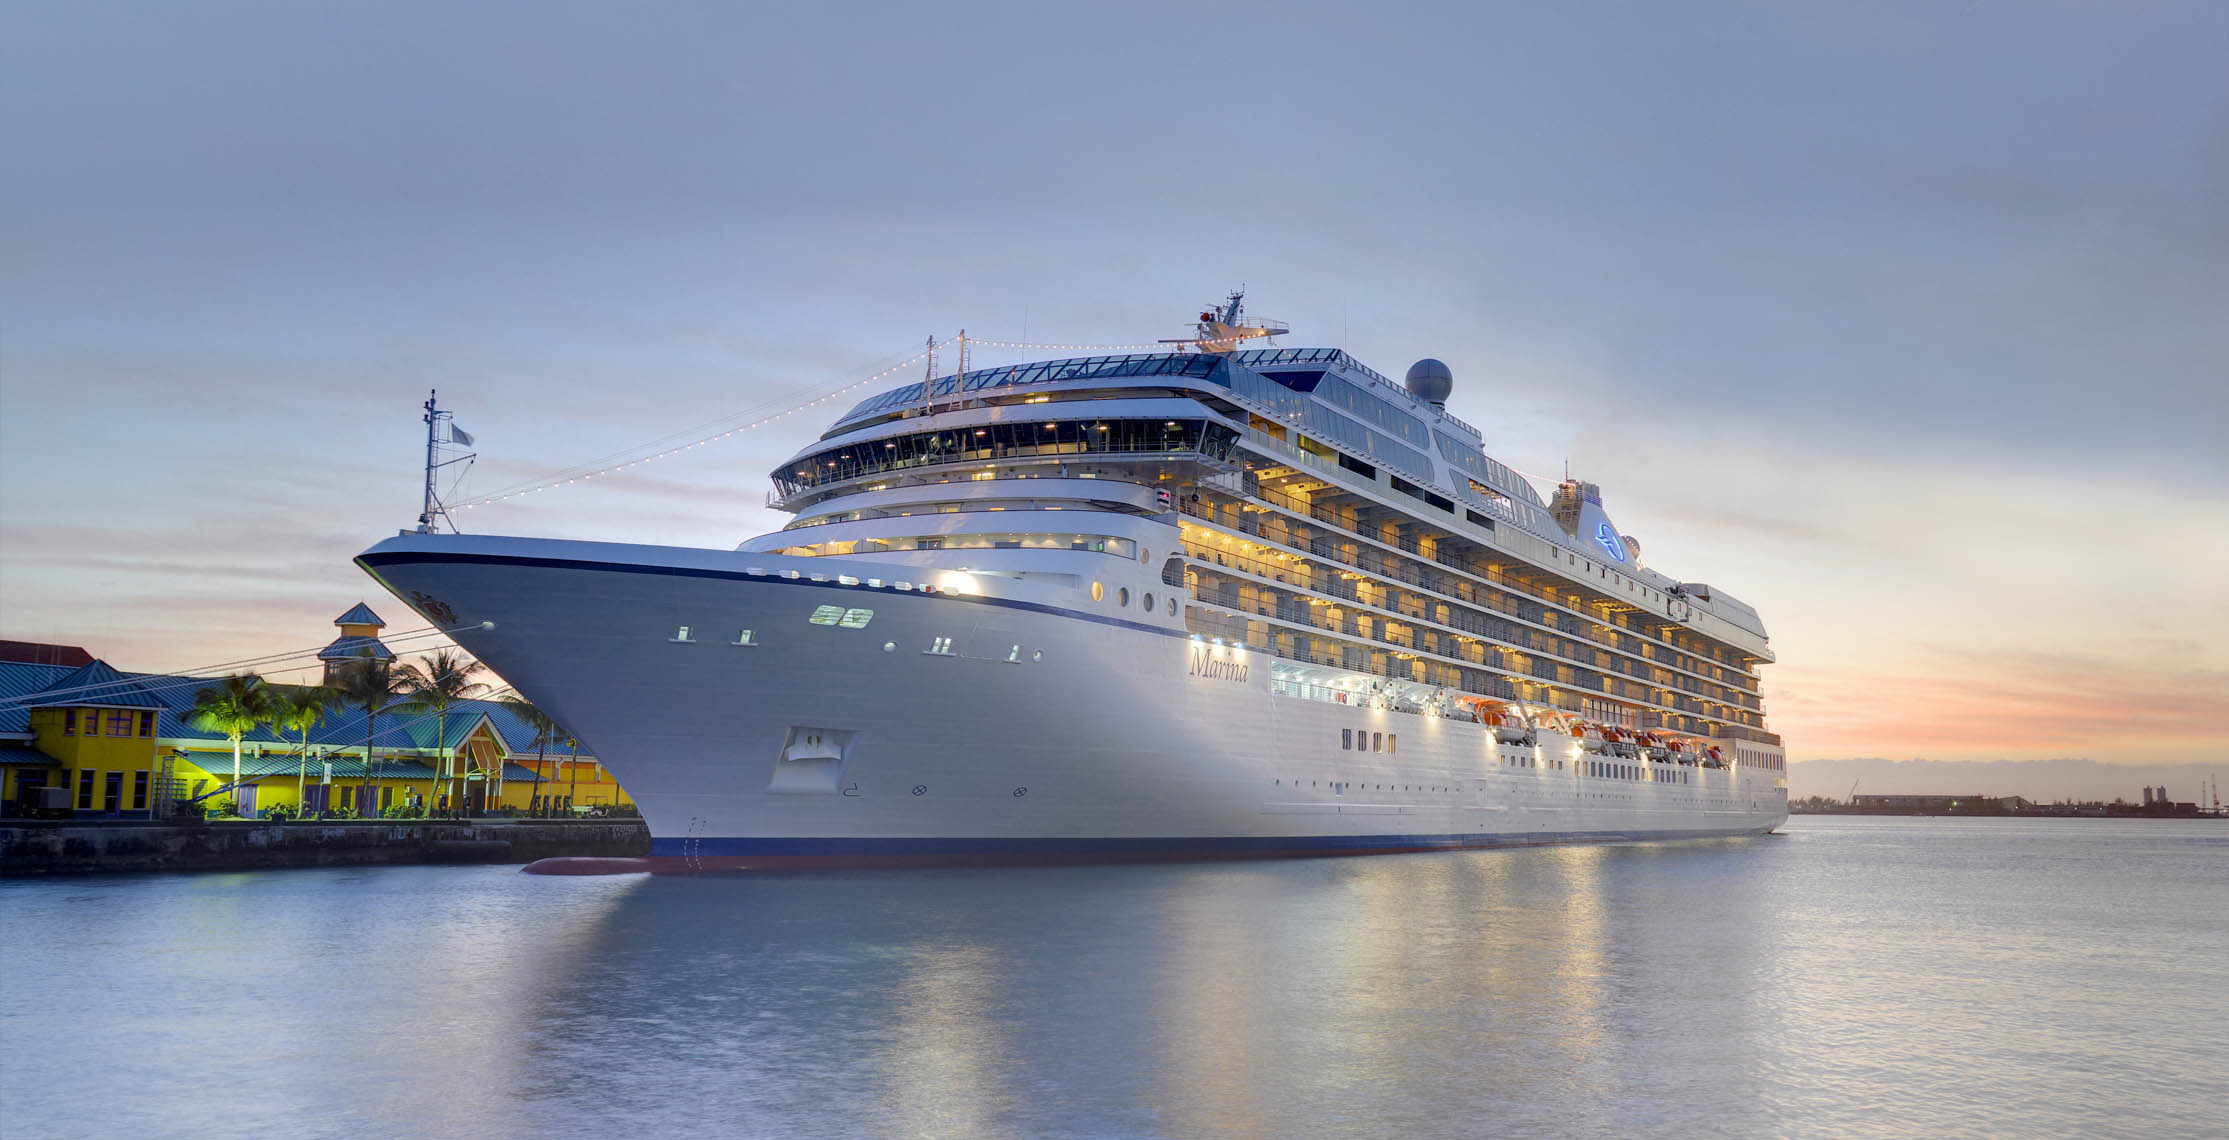 Pre-Cruise Savings with Oceania! 1